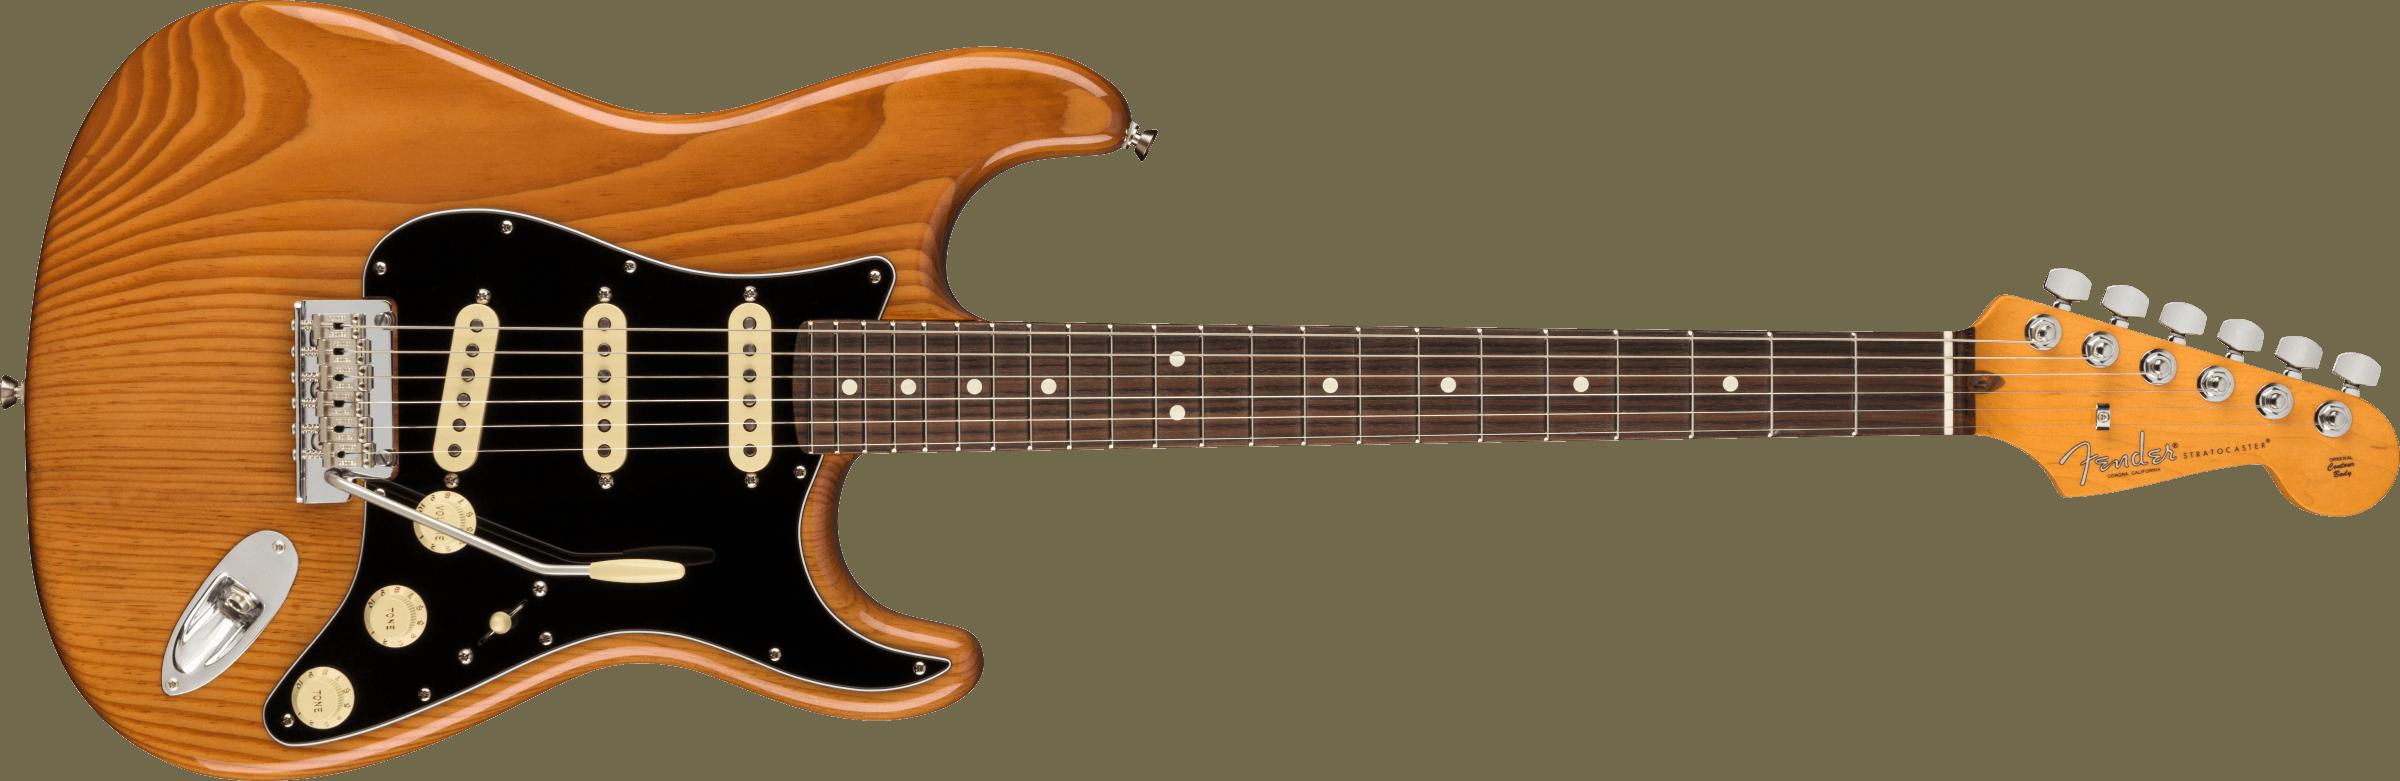 FENDER-American-Professional-II-Stratocaster-Rosewood-Fingerboard-Roasted-Pine-sku-571005523